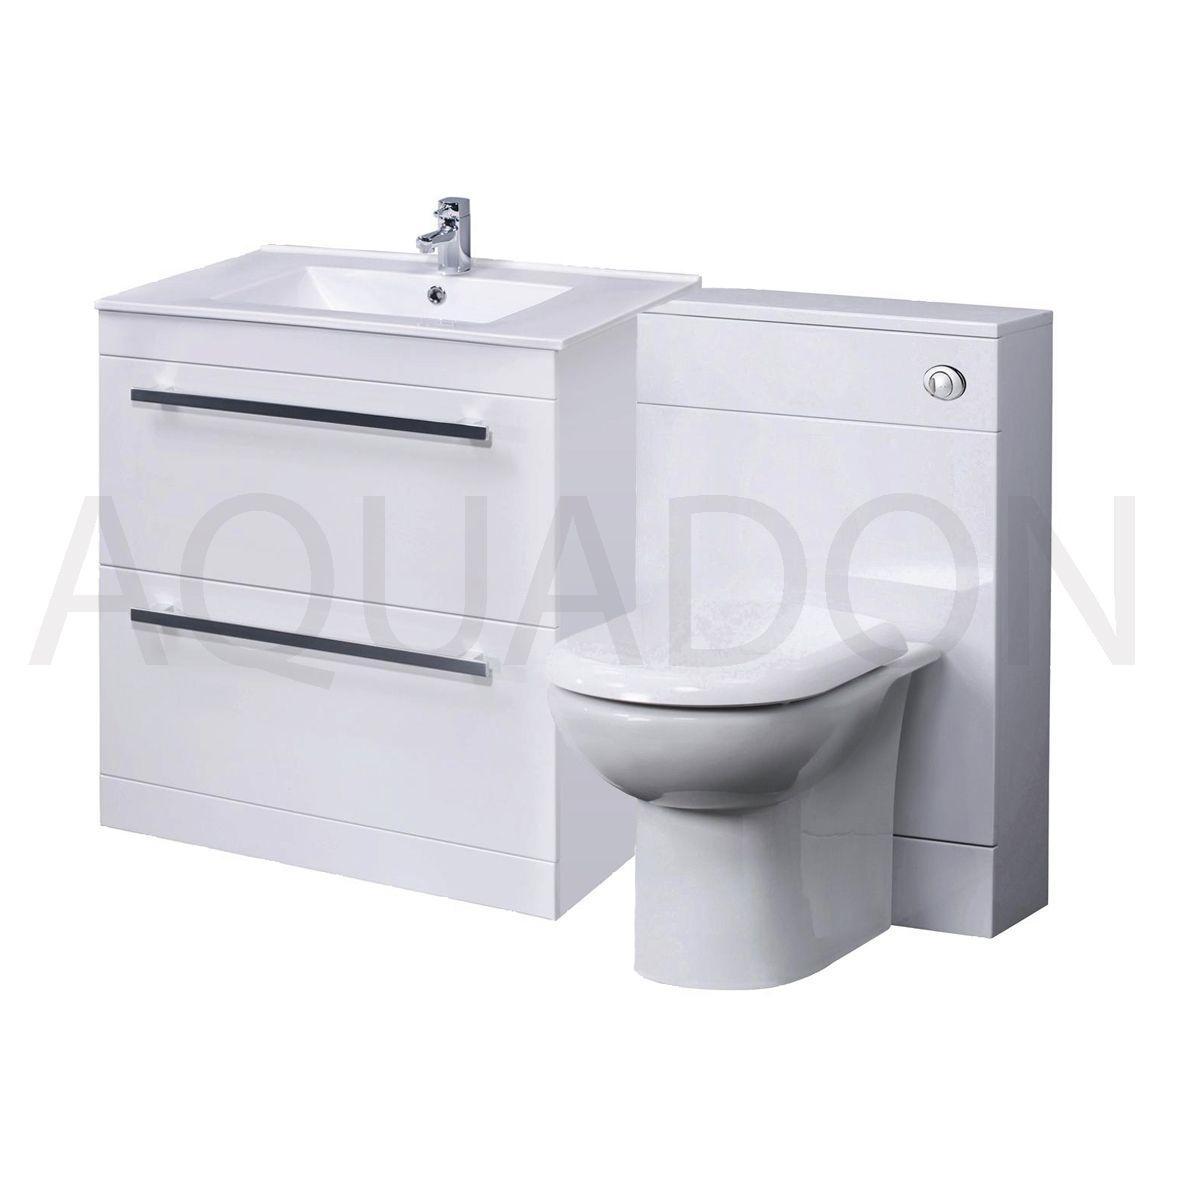 Vanity Toilet Combo Google Search Bathroom Sink Units Sink Units Bathroom Inspiration [ 1200 x 1200 Pixel ]